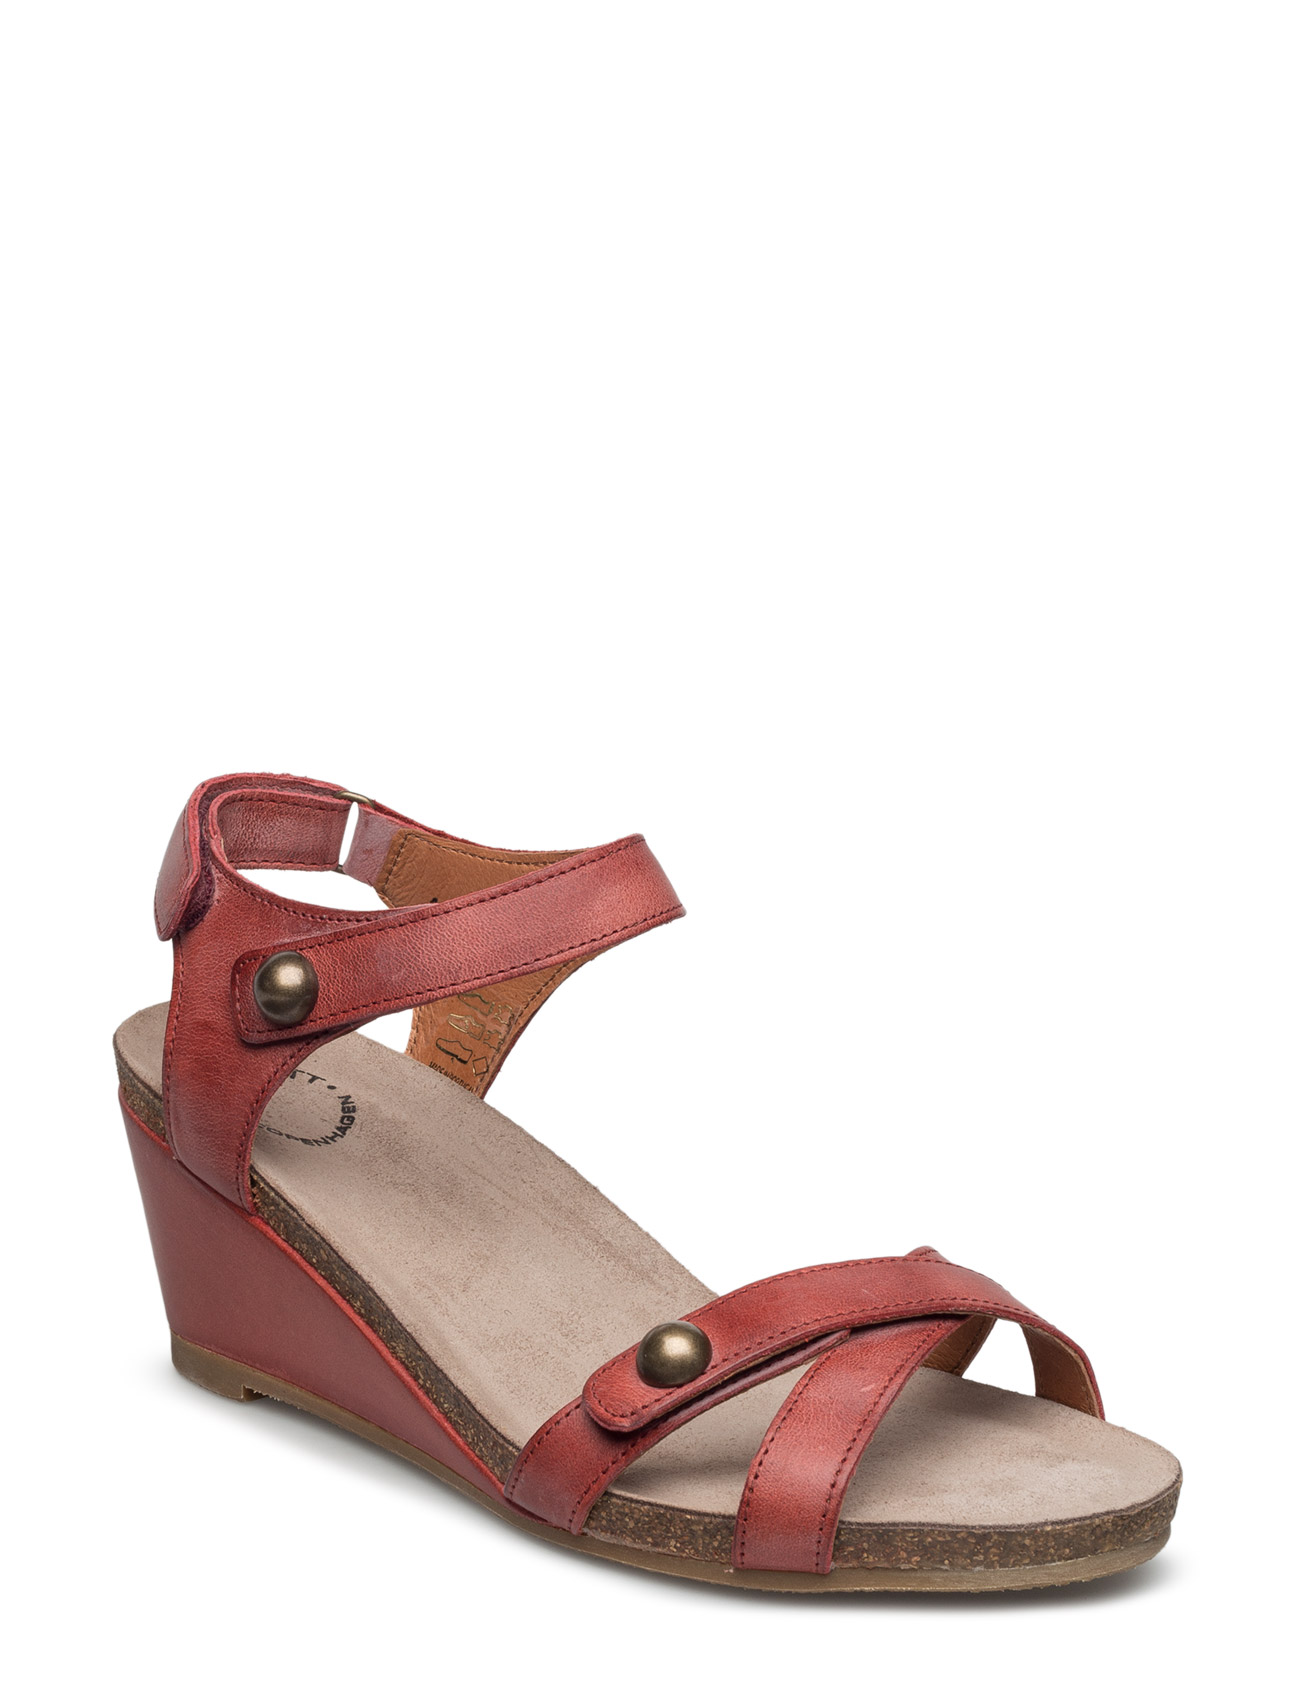 Sandals CASHOTT Sandaler til Damer i